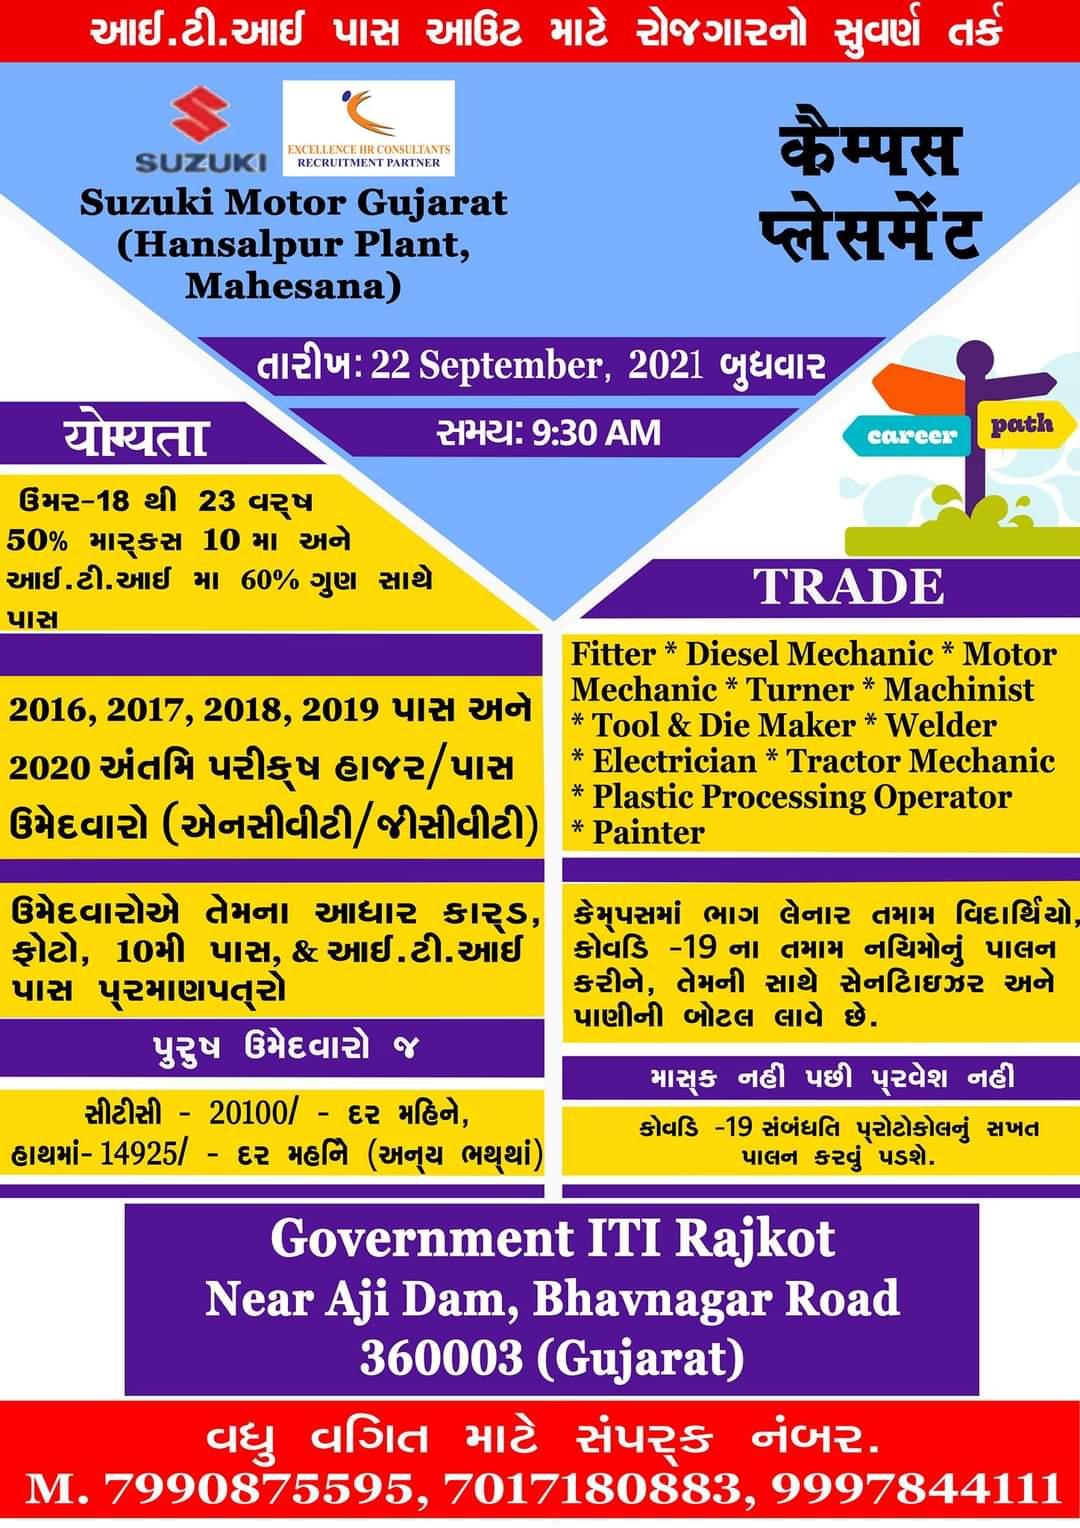 ITI Campus Placemat Recruitment 2021-22 For Suzuki Motors Cars Manufacturing Plant at  Govt. ITI Rajkot, Gujarat